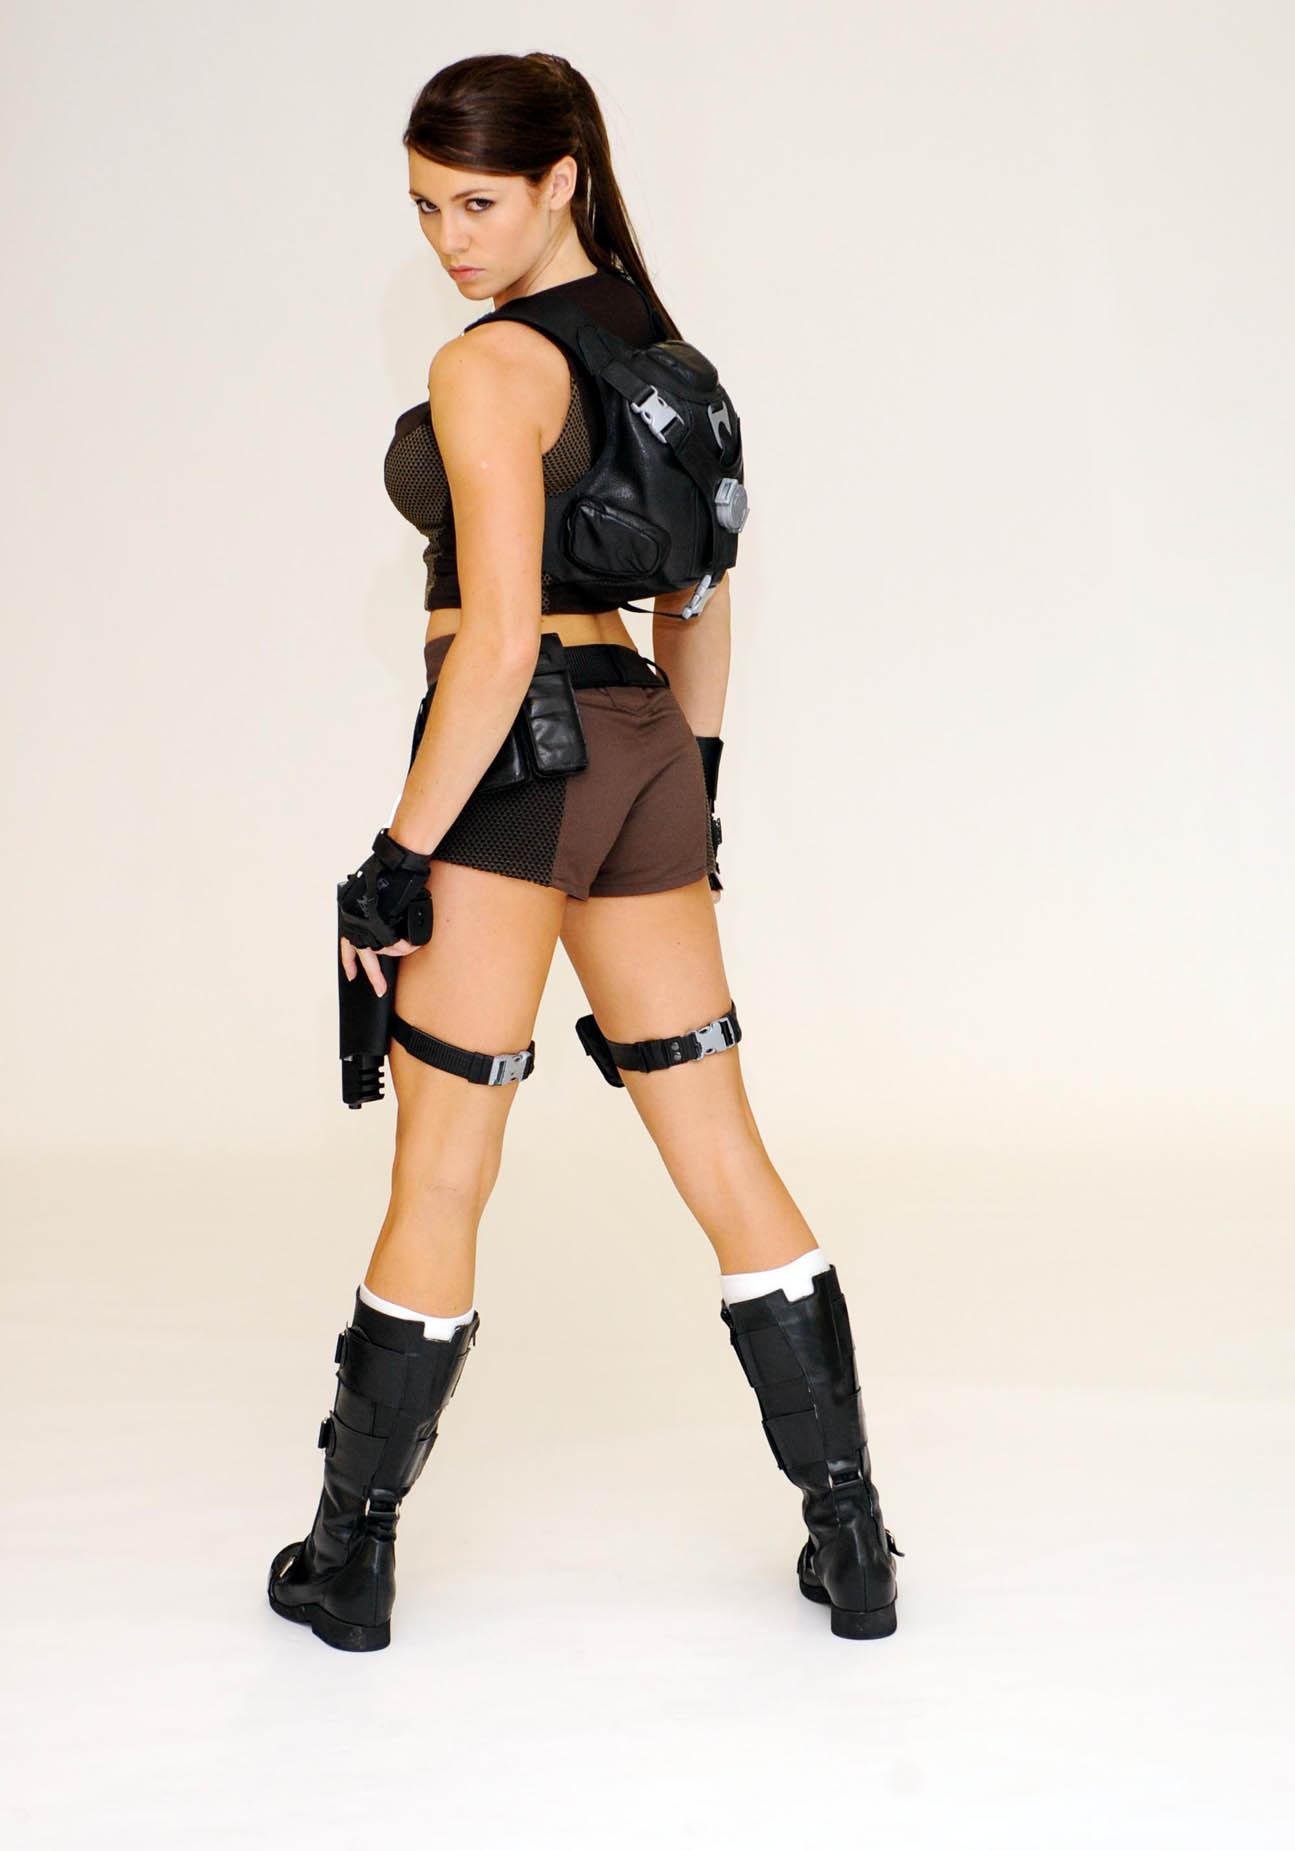 lara_croft_new_gun_outfit_10_big.jpg